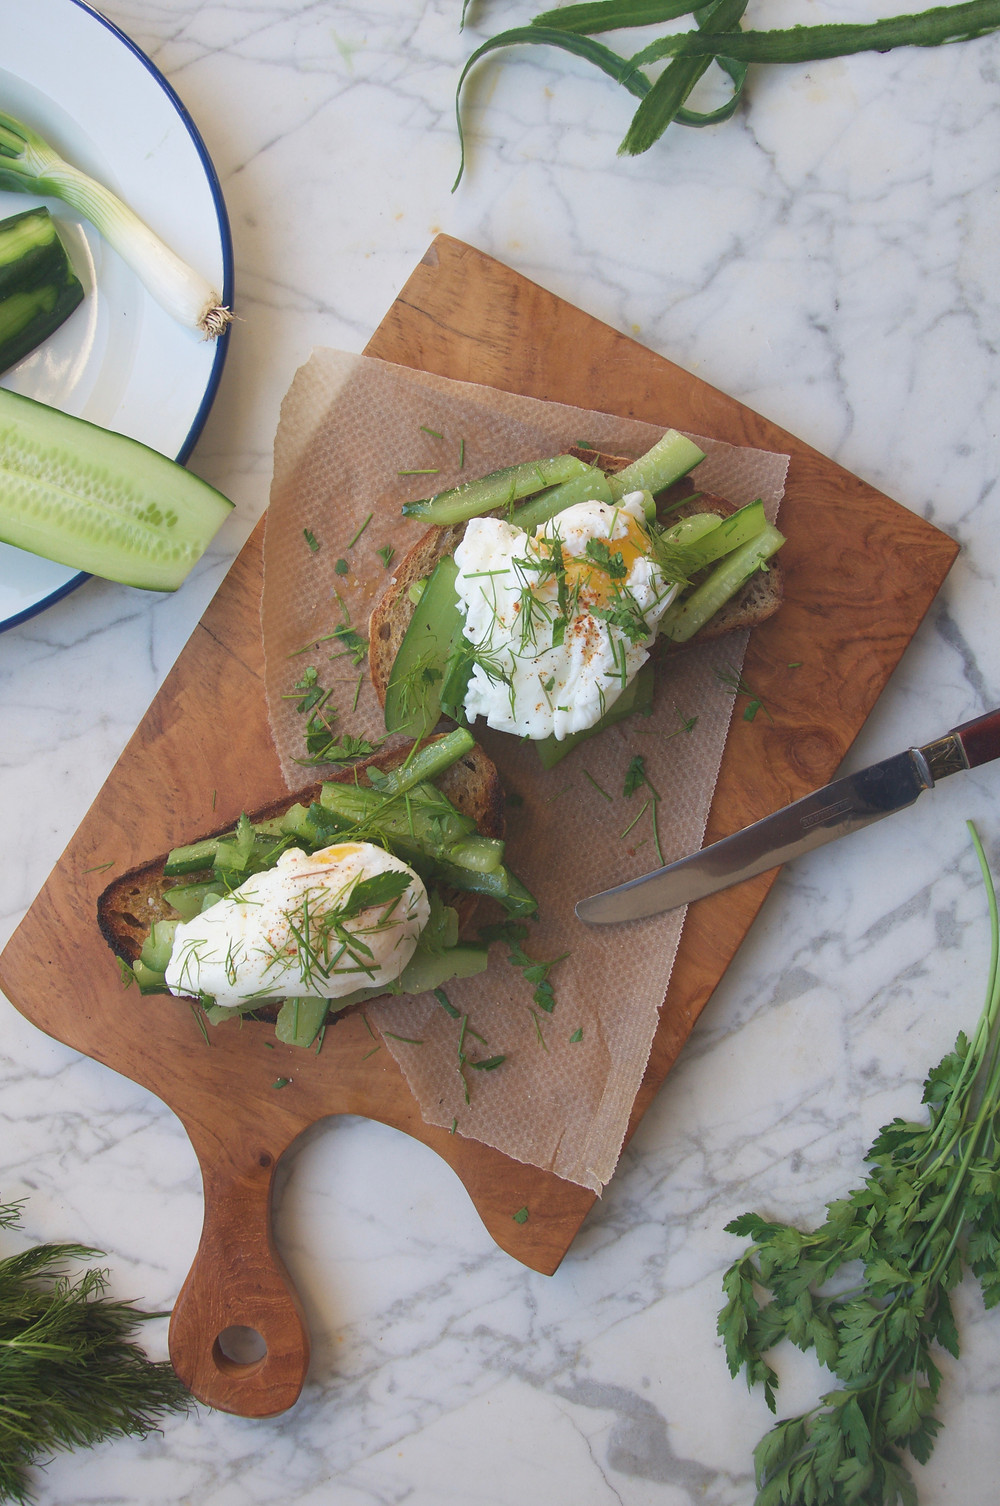 Baked Cucumber & Dill Tartine